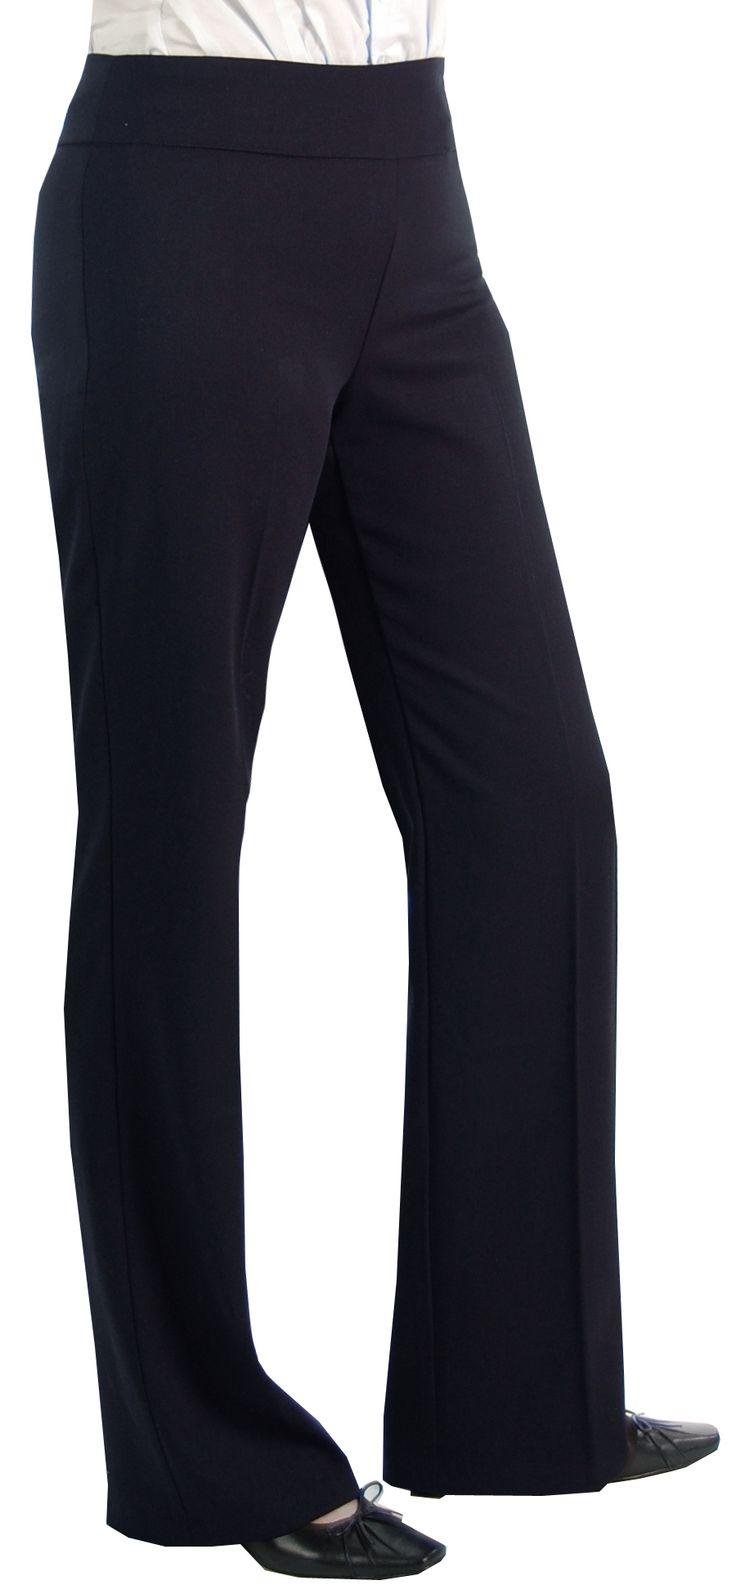 Jcp Tall Yoga Pants